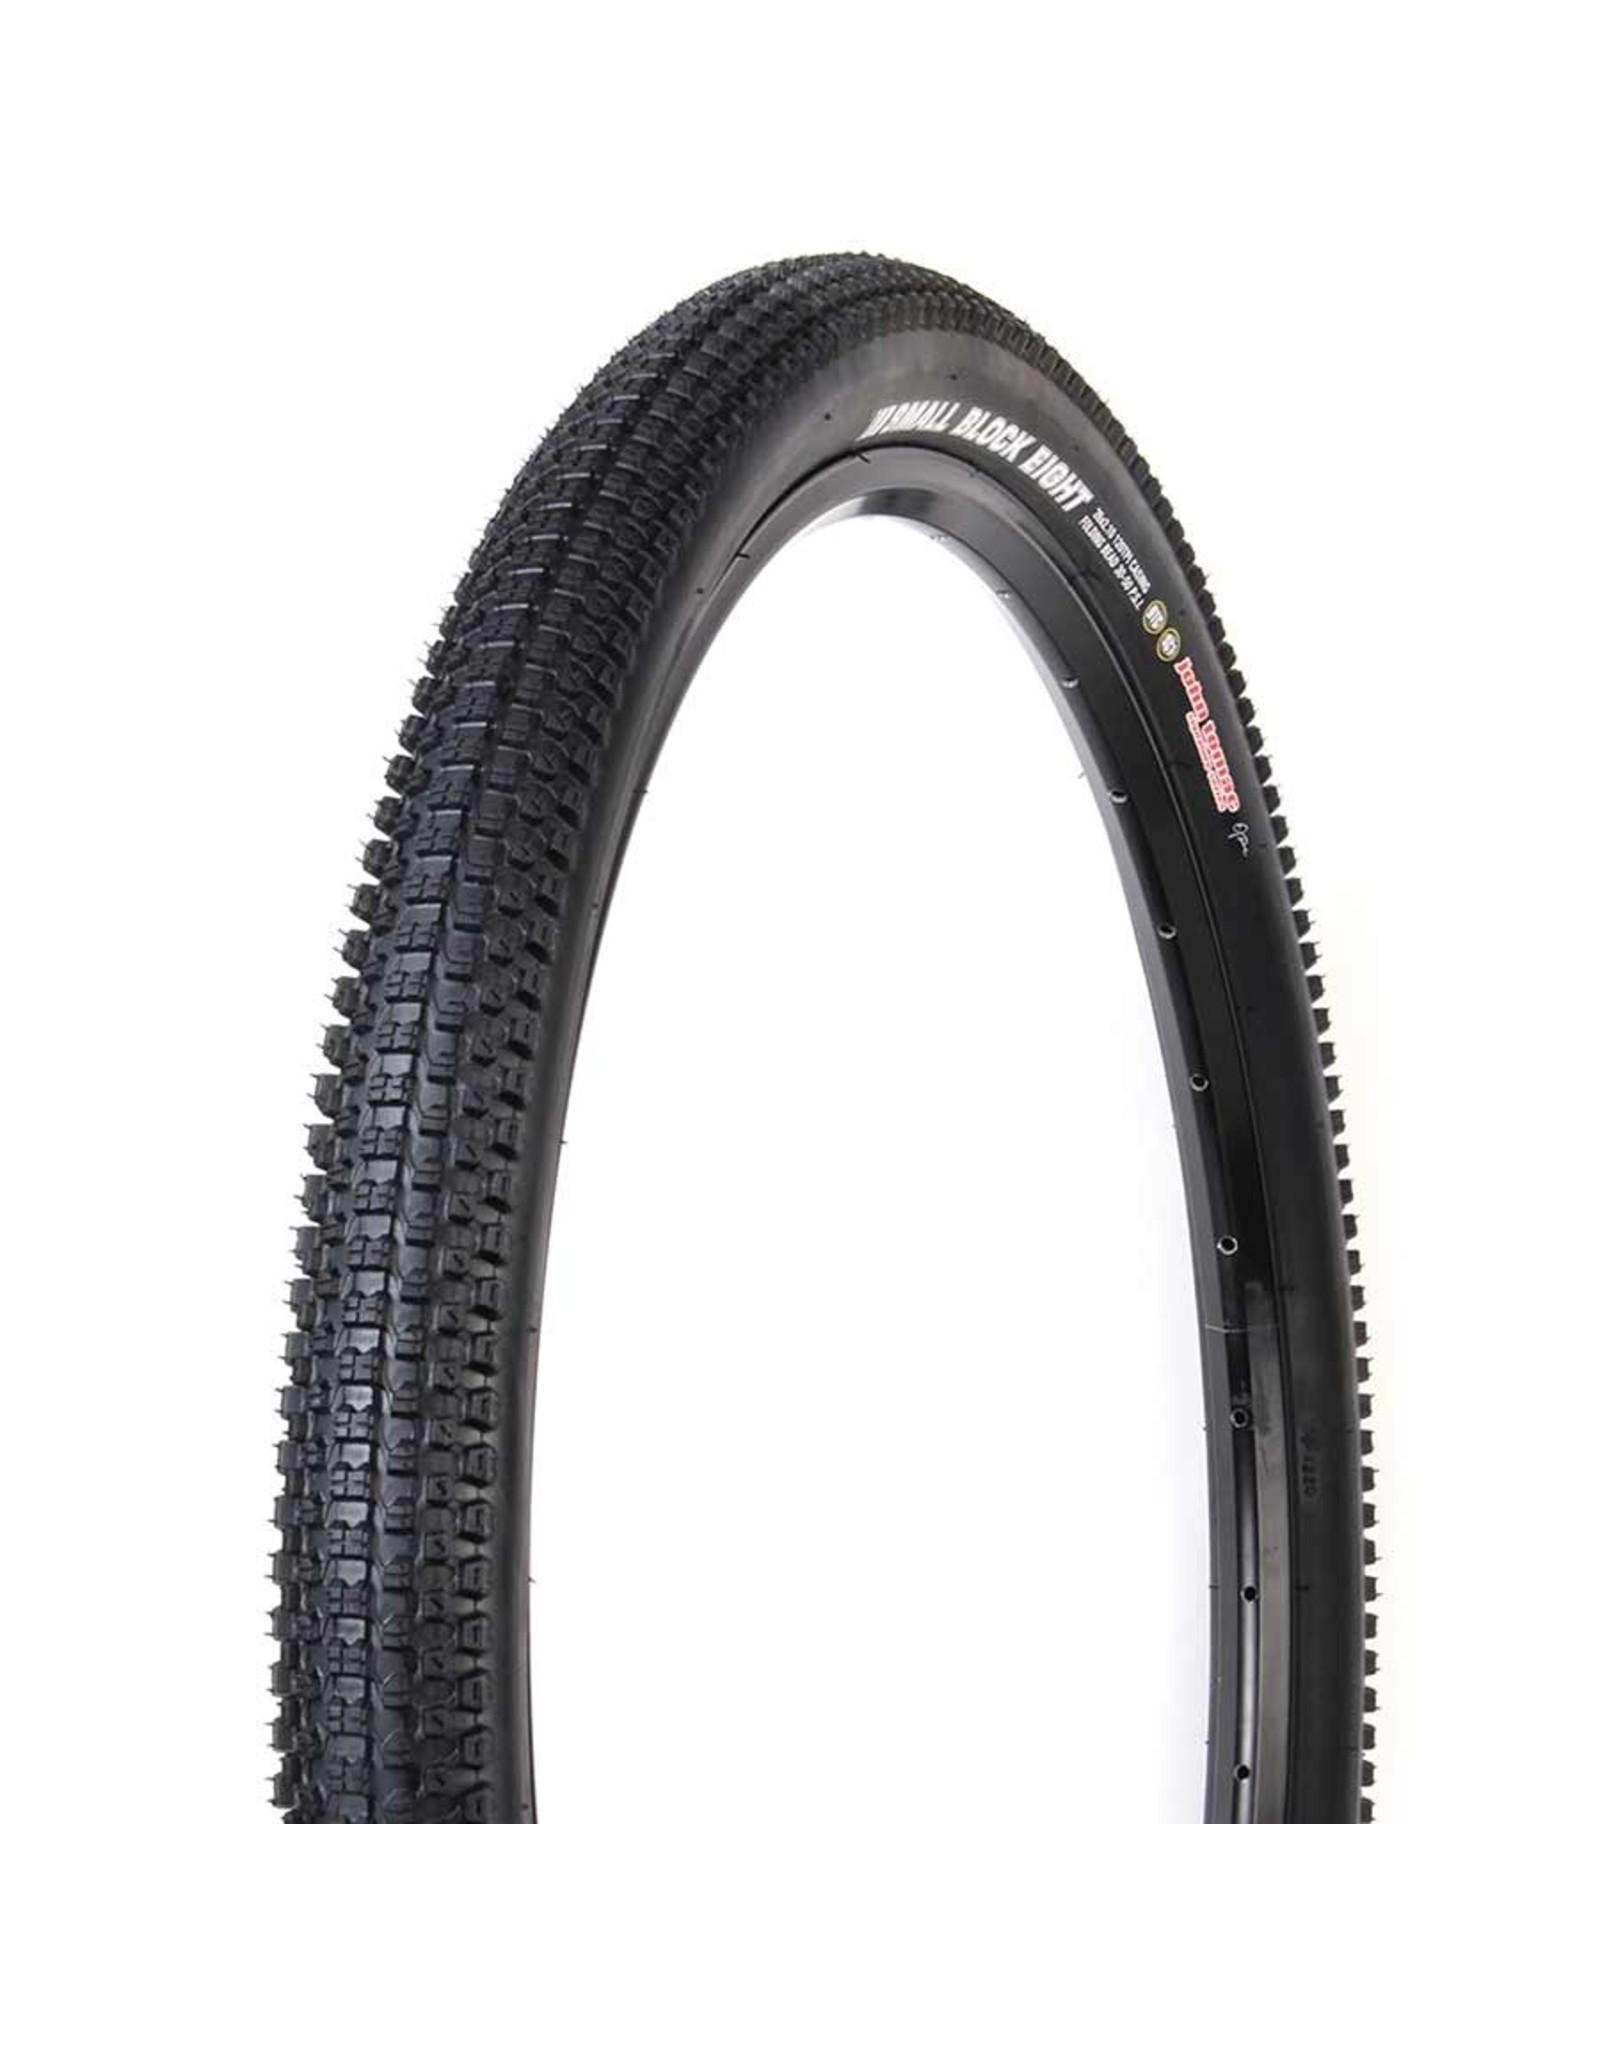 Kenda Kenda, Small Block 8, Tire, 26''x2.10, Wire, Clincher, DTC, 60TPI, Black